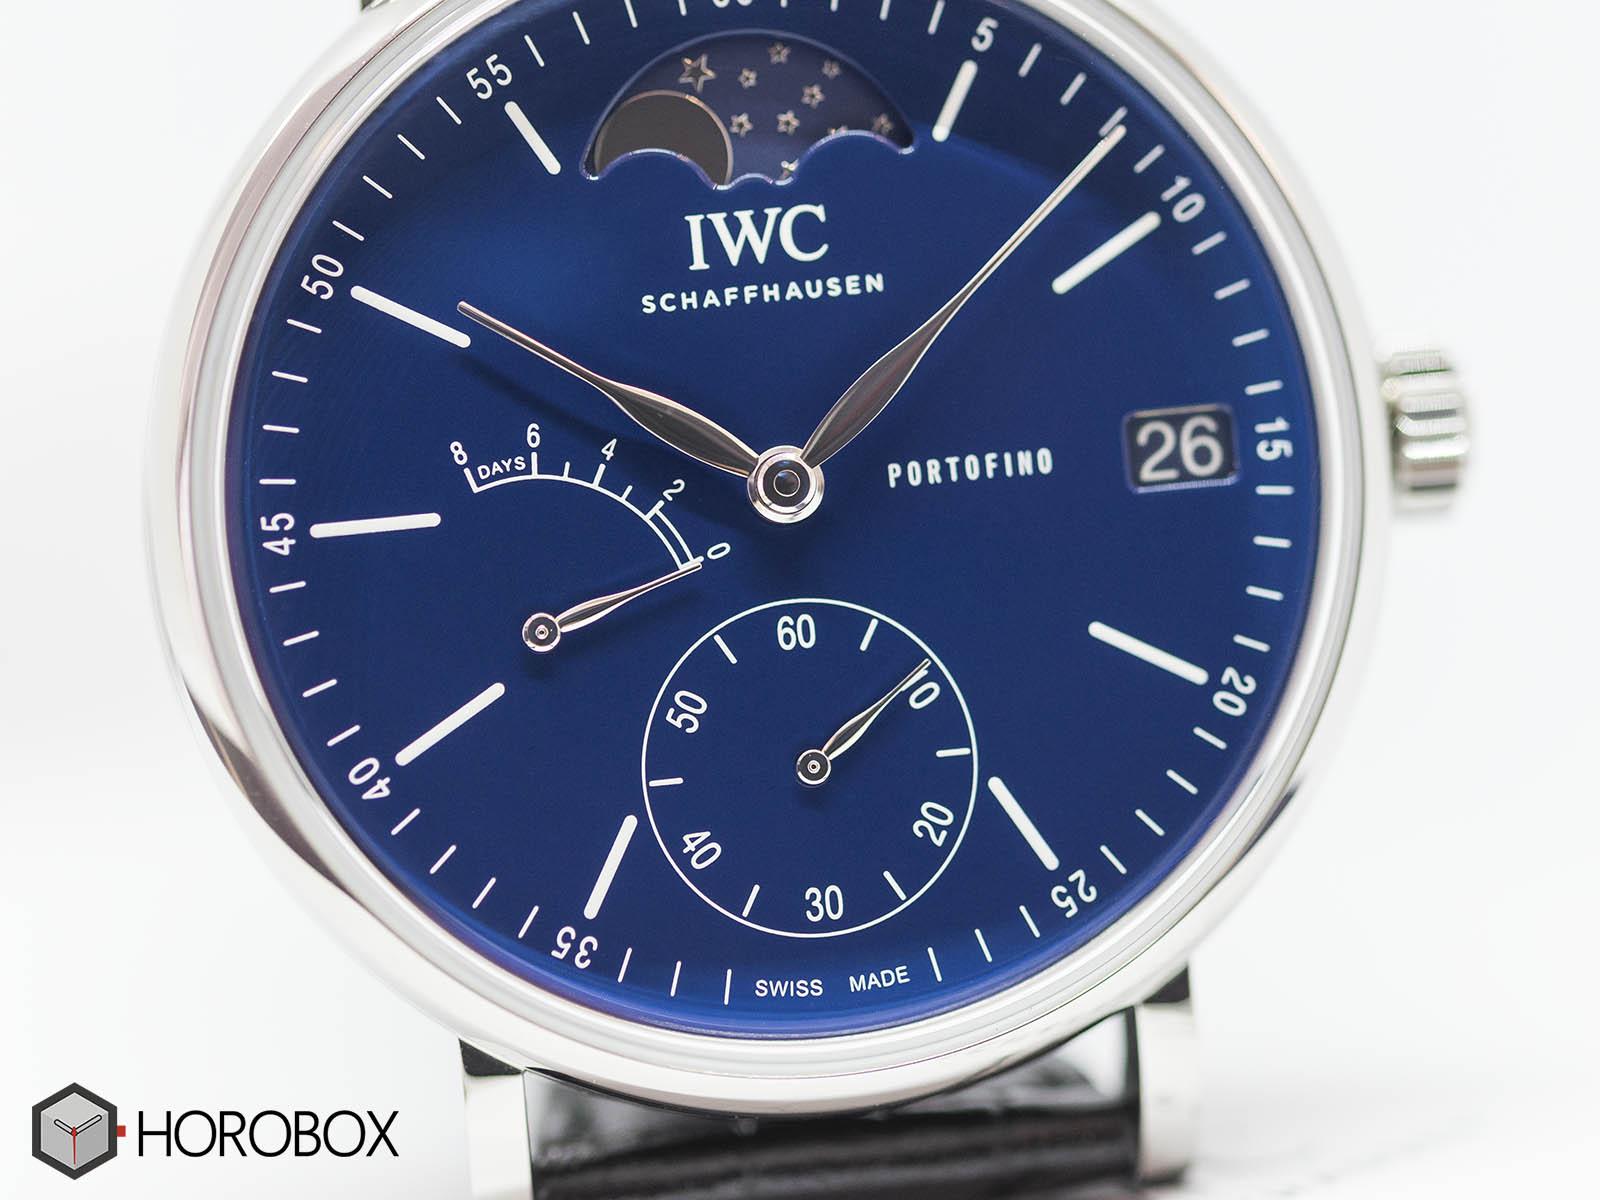 iw516405-iwc-portofino-hand-wound-moon-phase-150-4.jpg